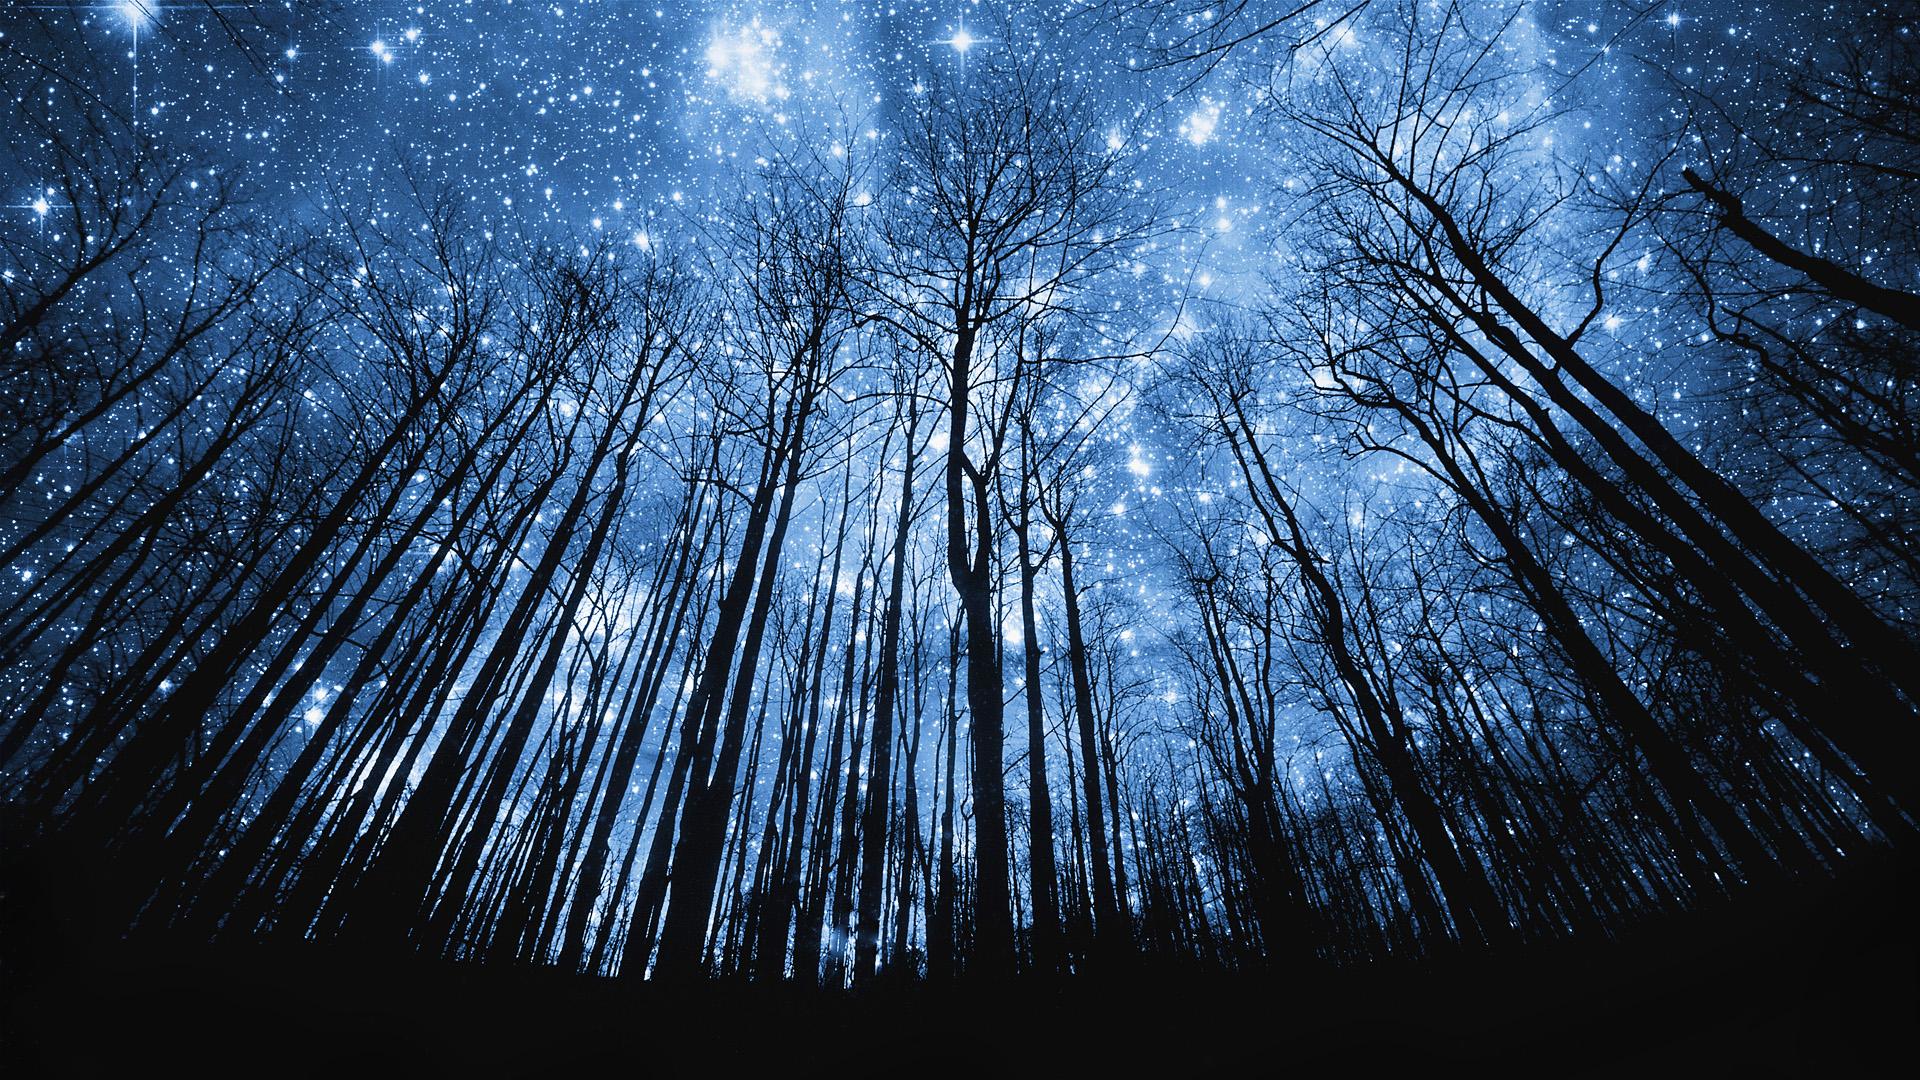 Beautiful Star Raining - Beautiful Star Raining